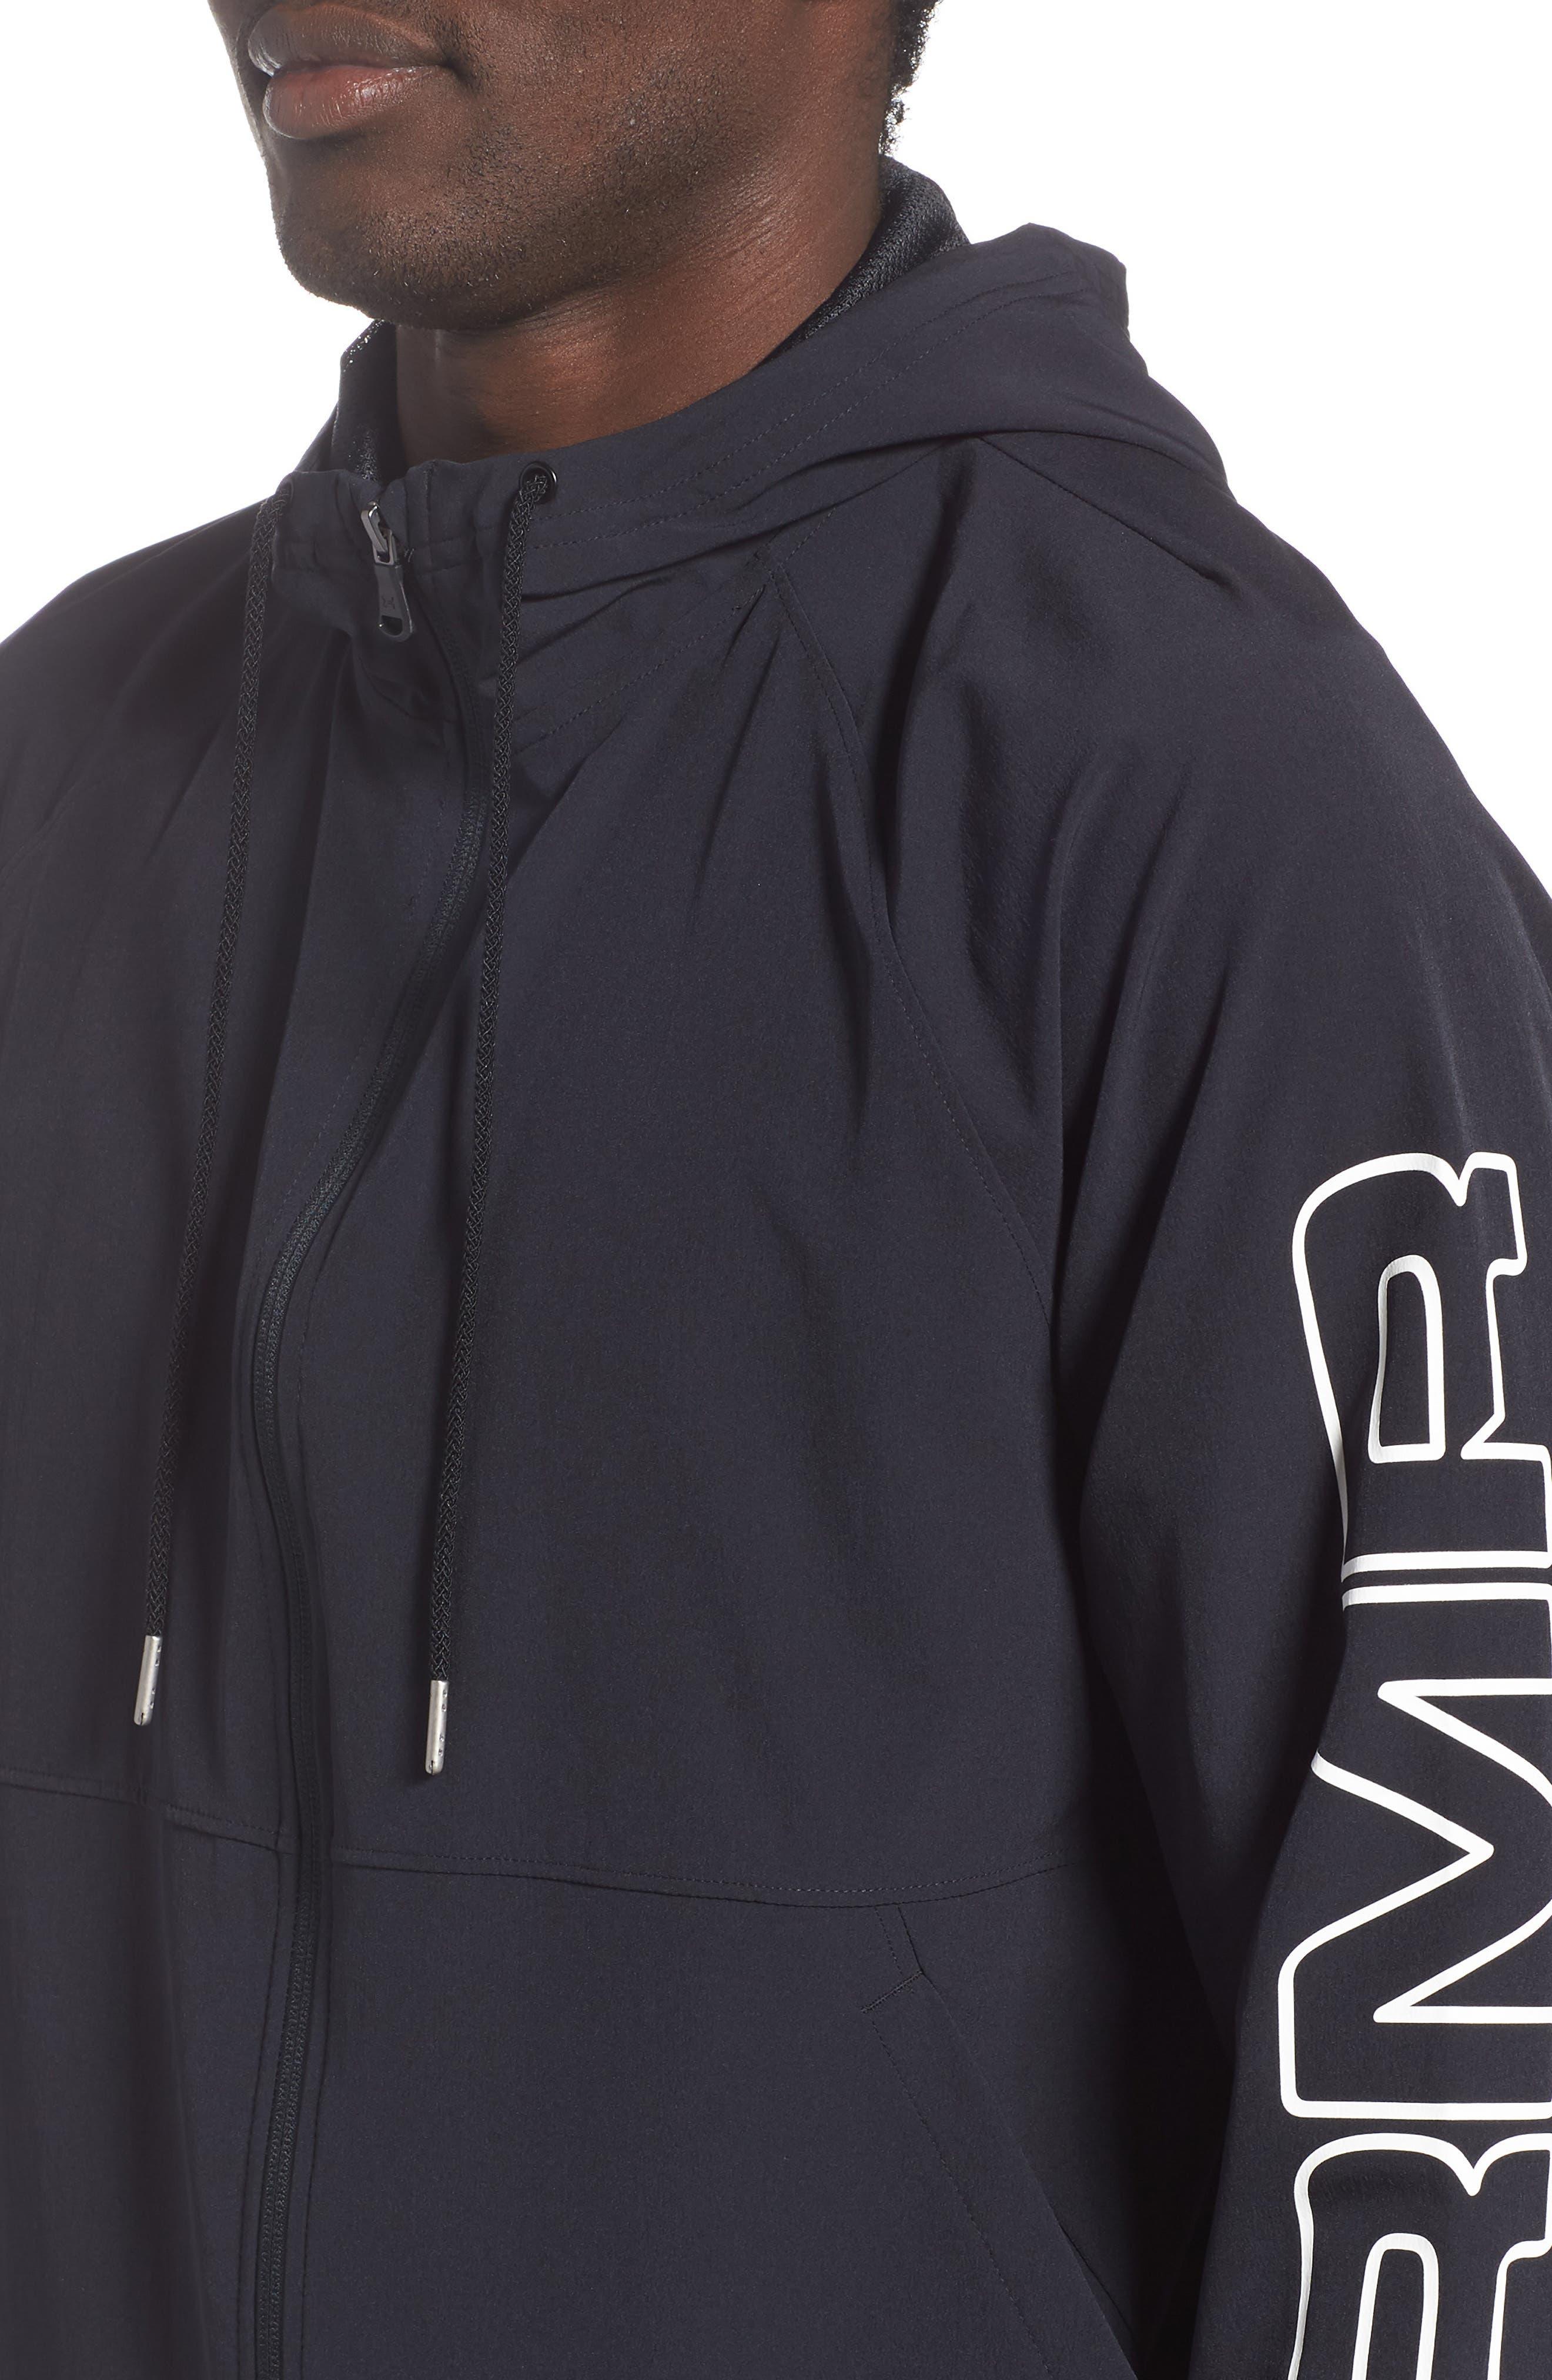 UNDER ARMOUR, Baseline Hooded Jacket, Alternate thumbnail 5, color, 001